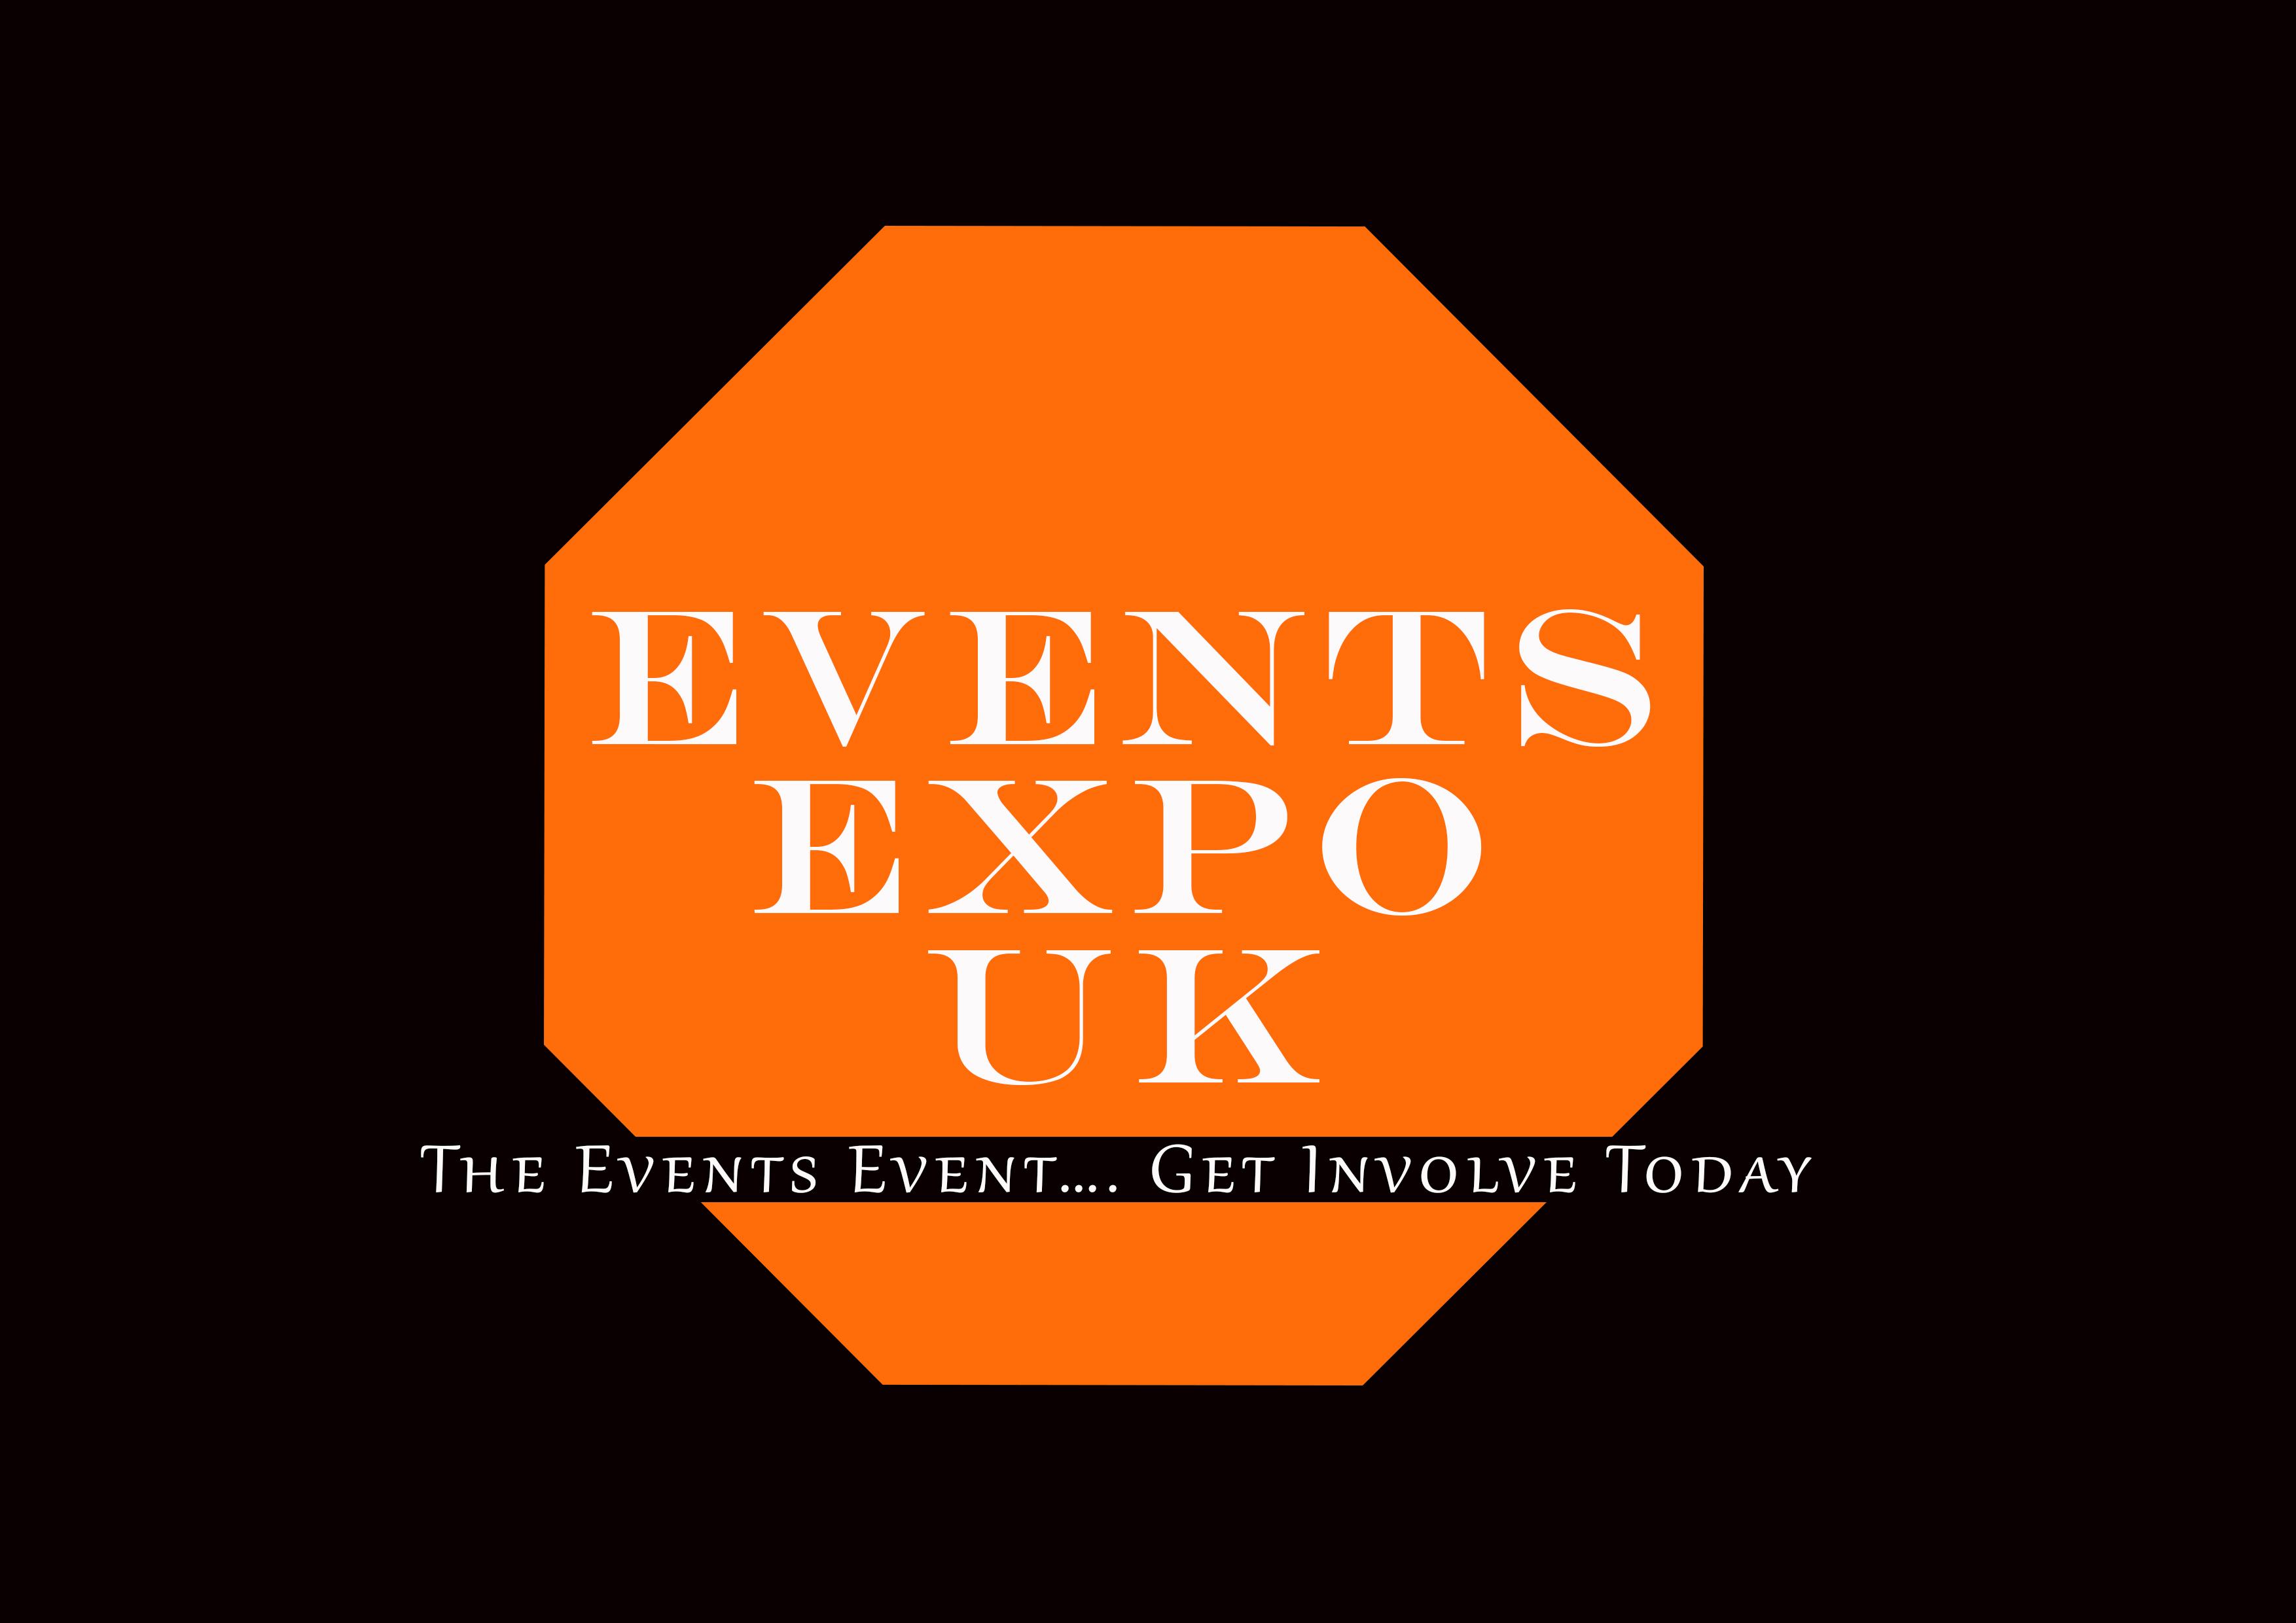 EVENT EXPO UK